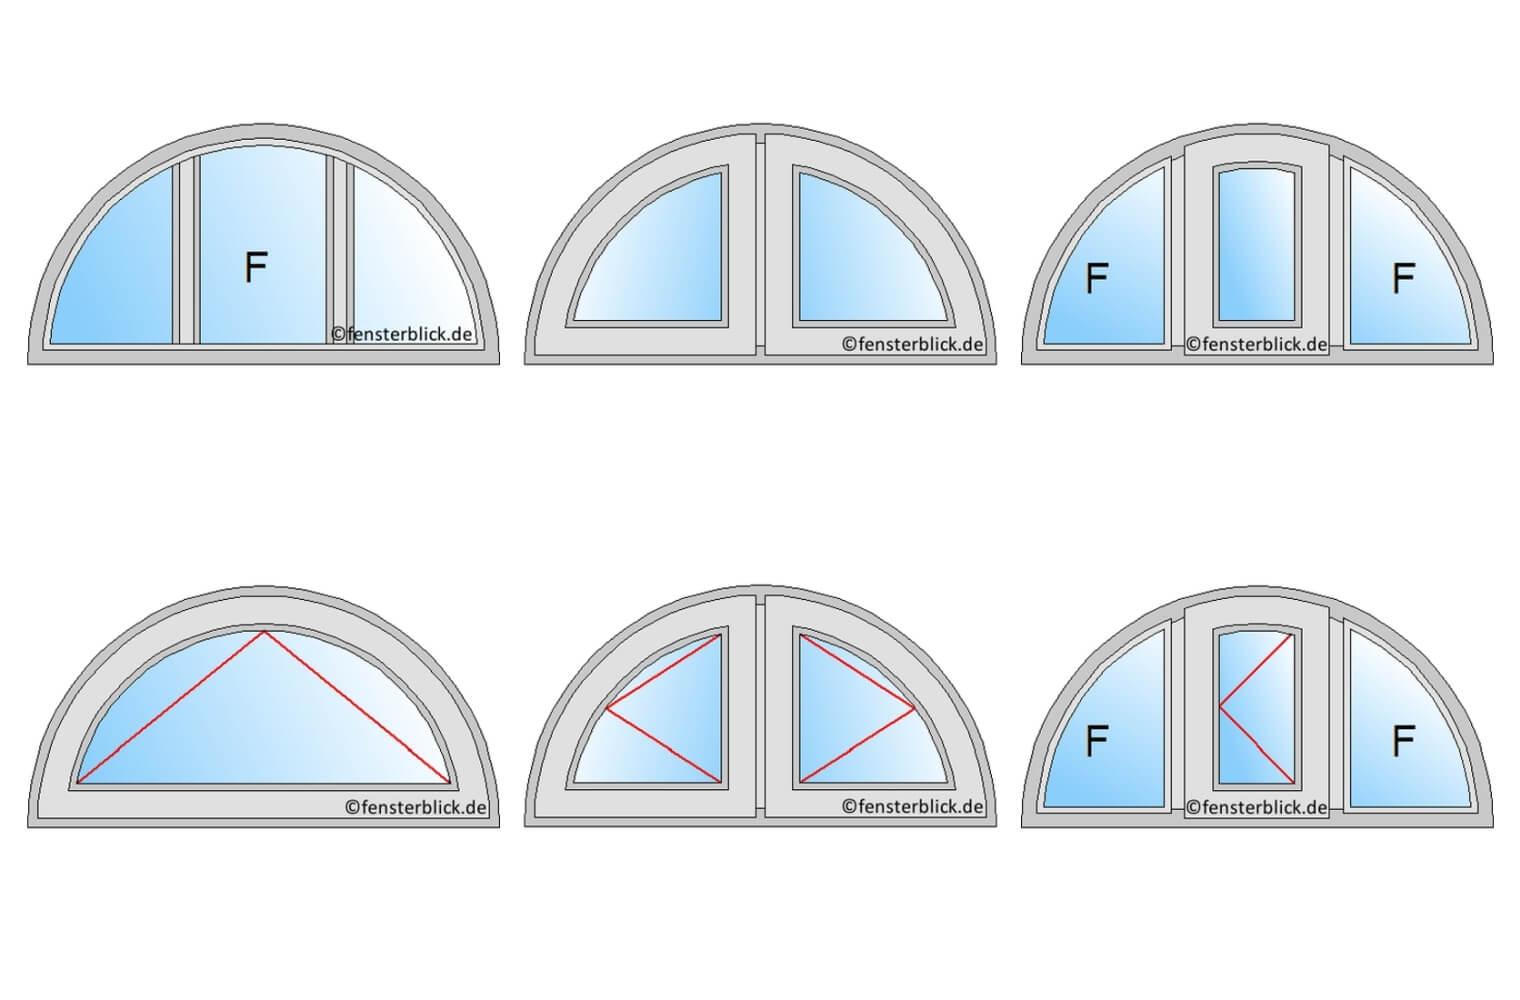 Fabulous Rundes Fenster günstig online kaufen - fensterblick.de TW35